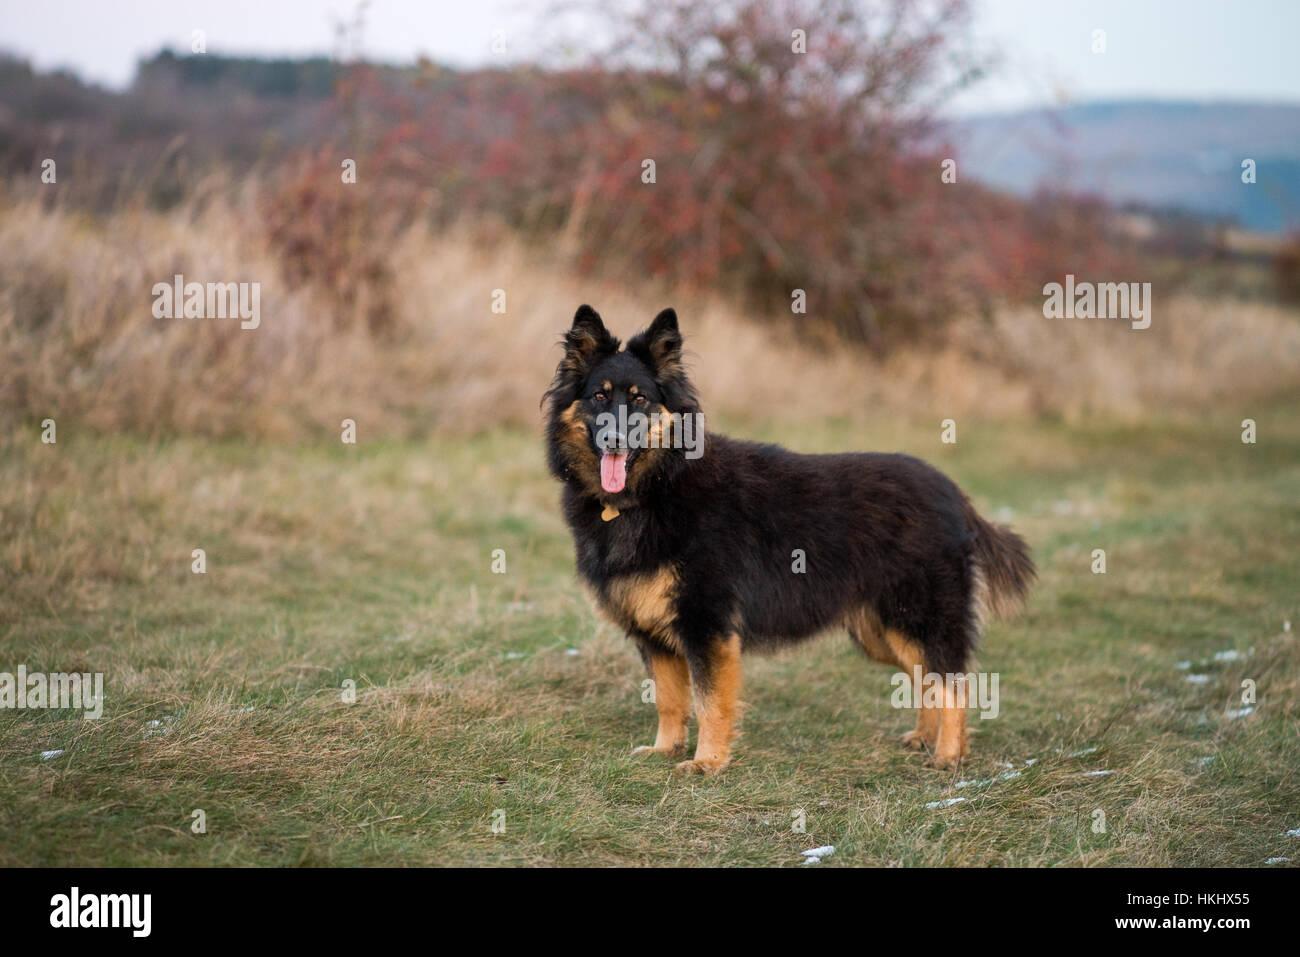 Chodsky pes Stock Photo, Royalty Free Image: 132544753 - Alamy